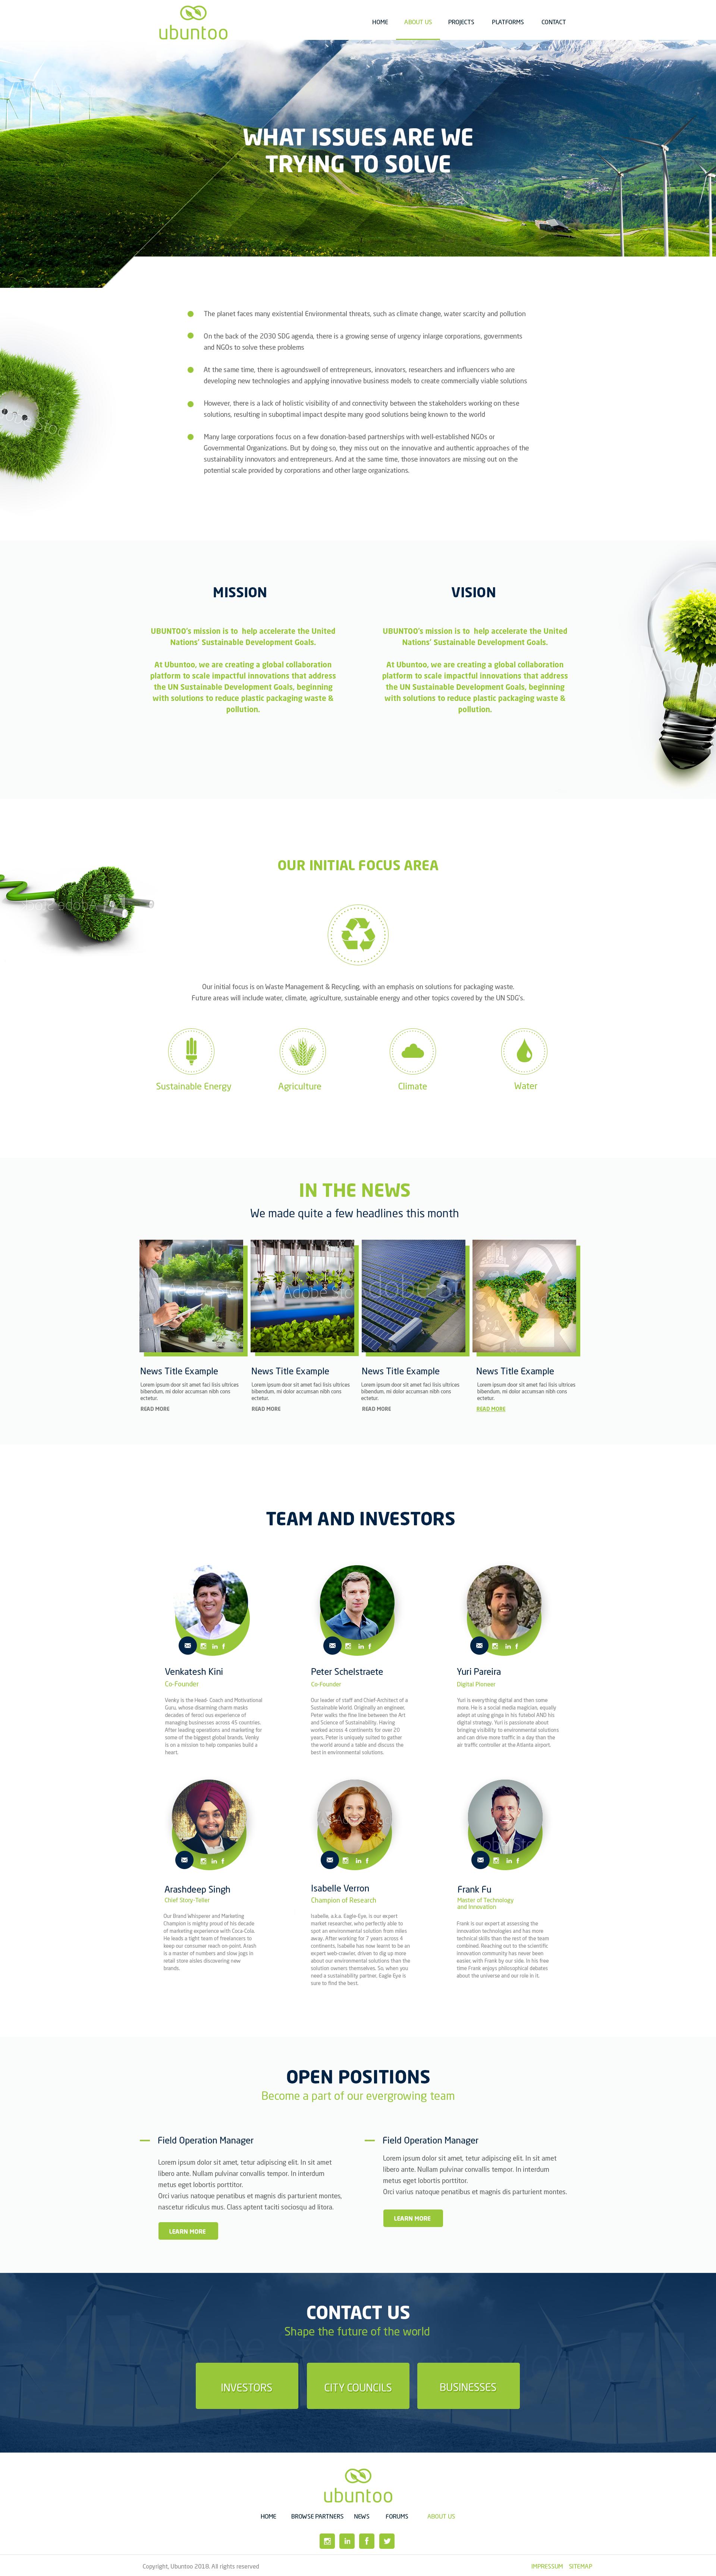 Design a web page 'About Us'